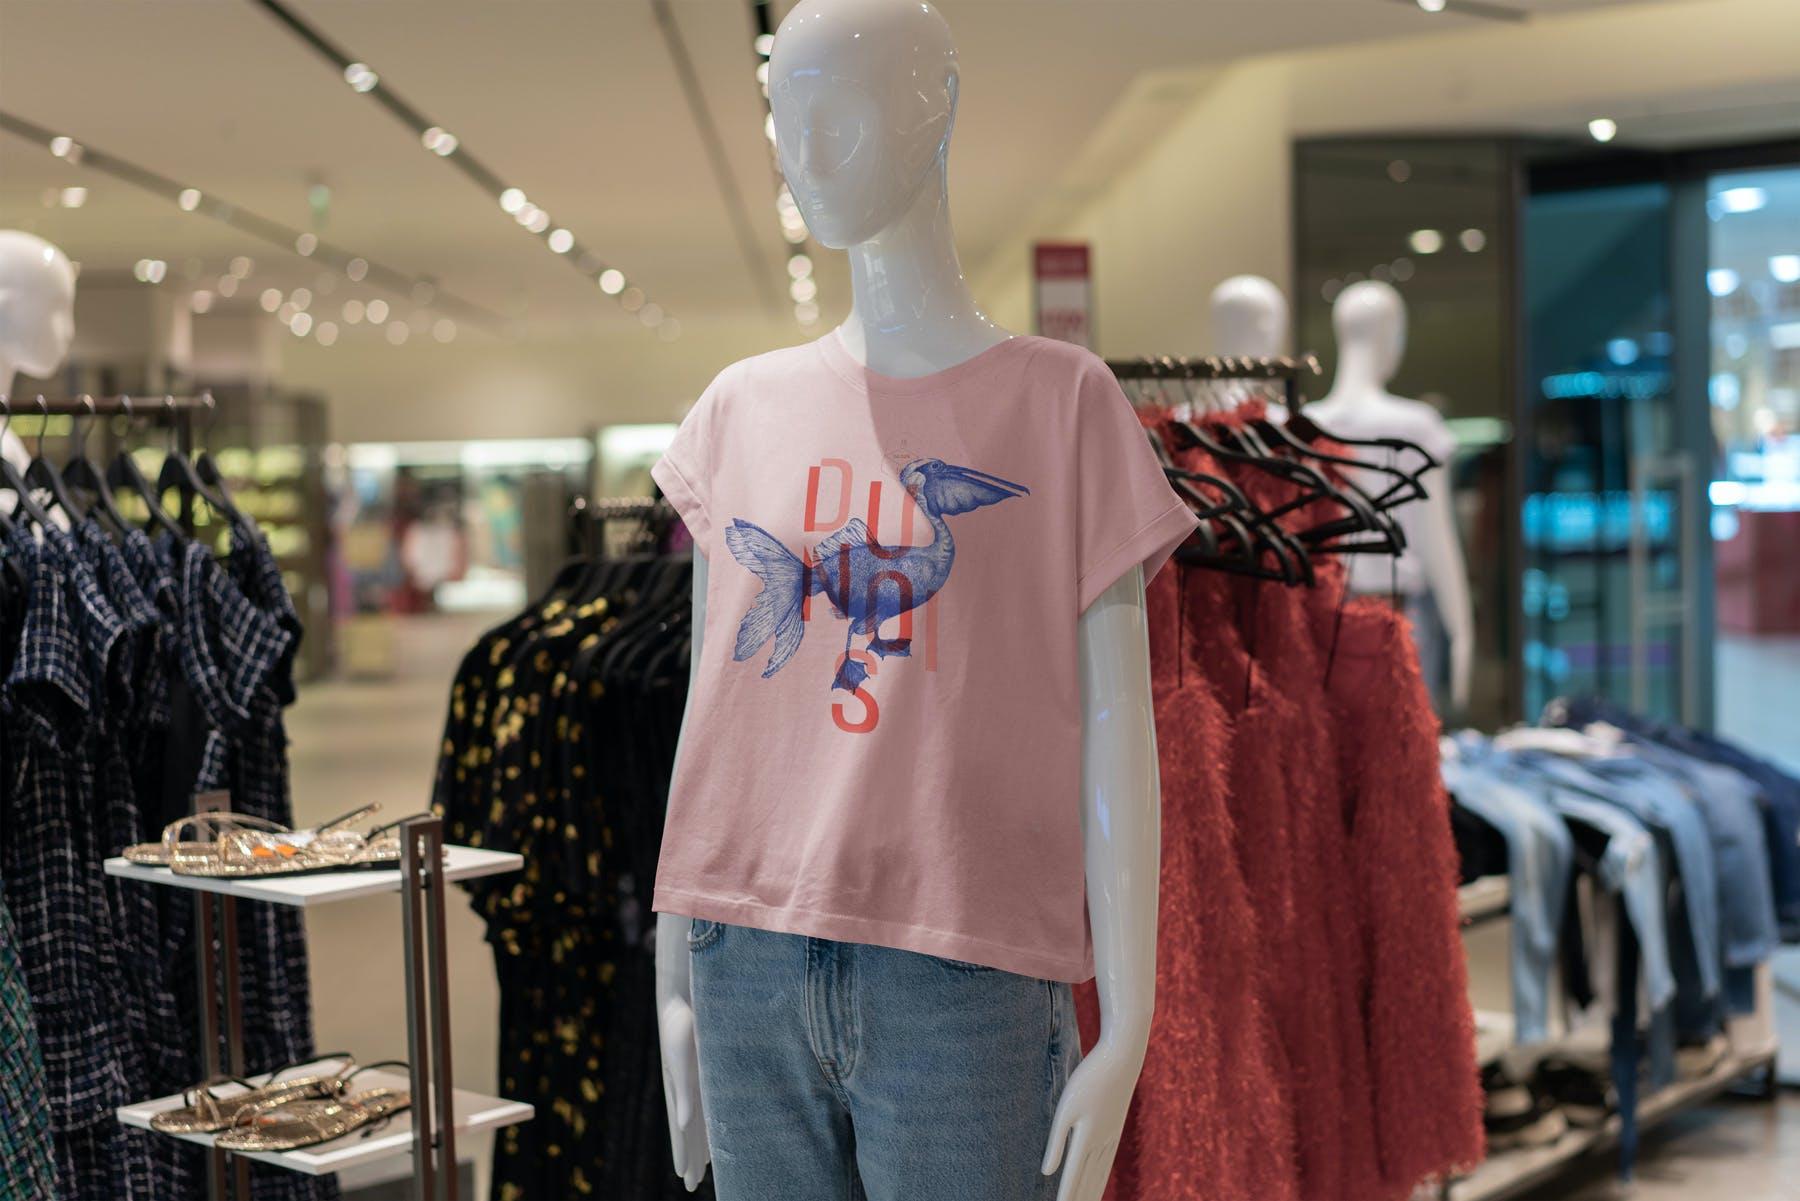 10款T恤半袖衫PSD样机模板 T-Shirt Shopping Mockup Vol.2插图(9)